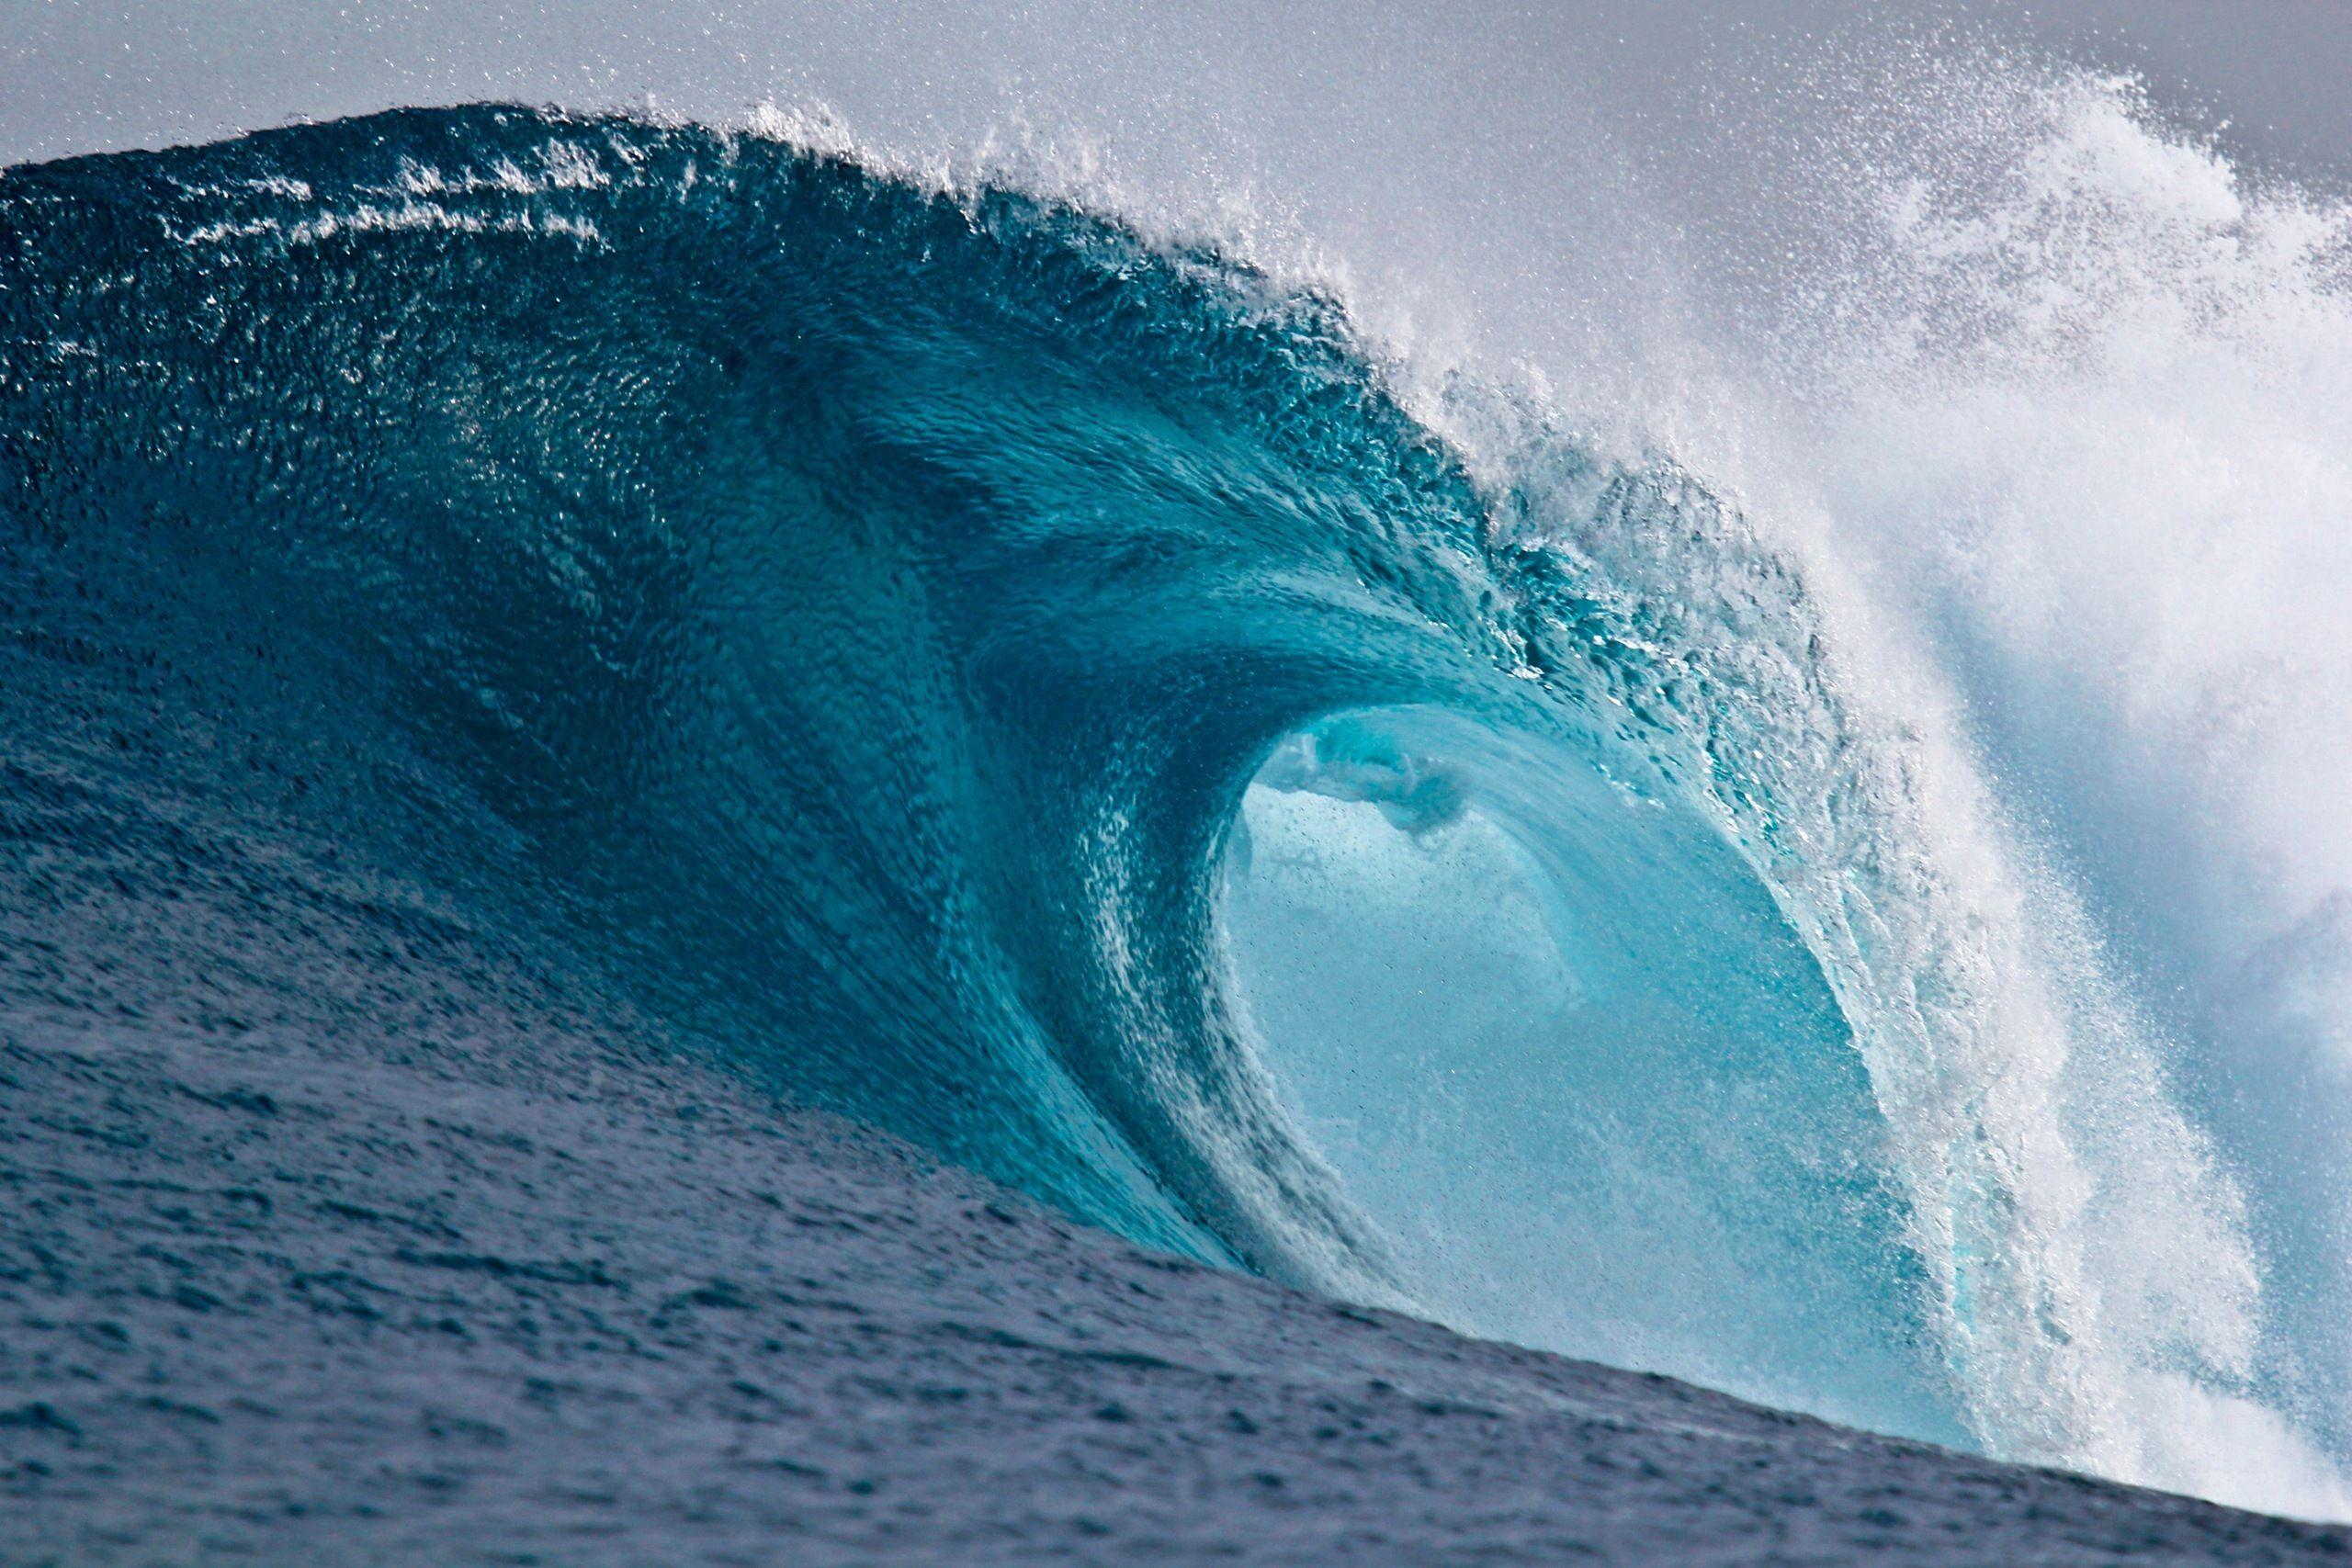 Big Ocean Waves Alpha Coders Wallpaper Abyss Earth Wave